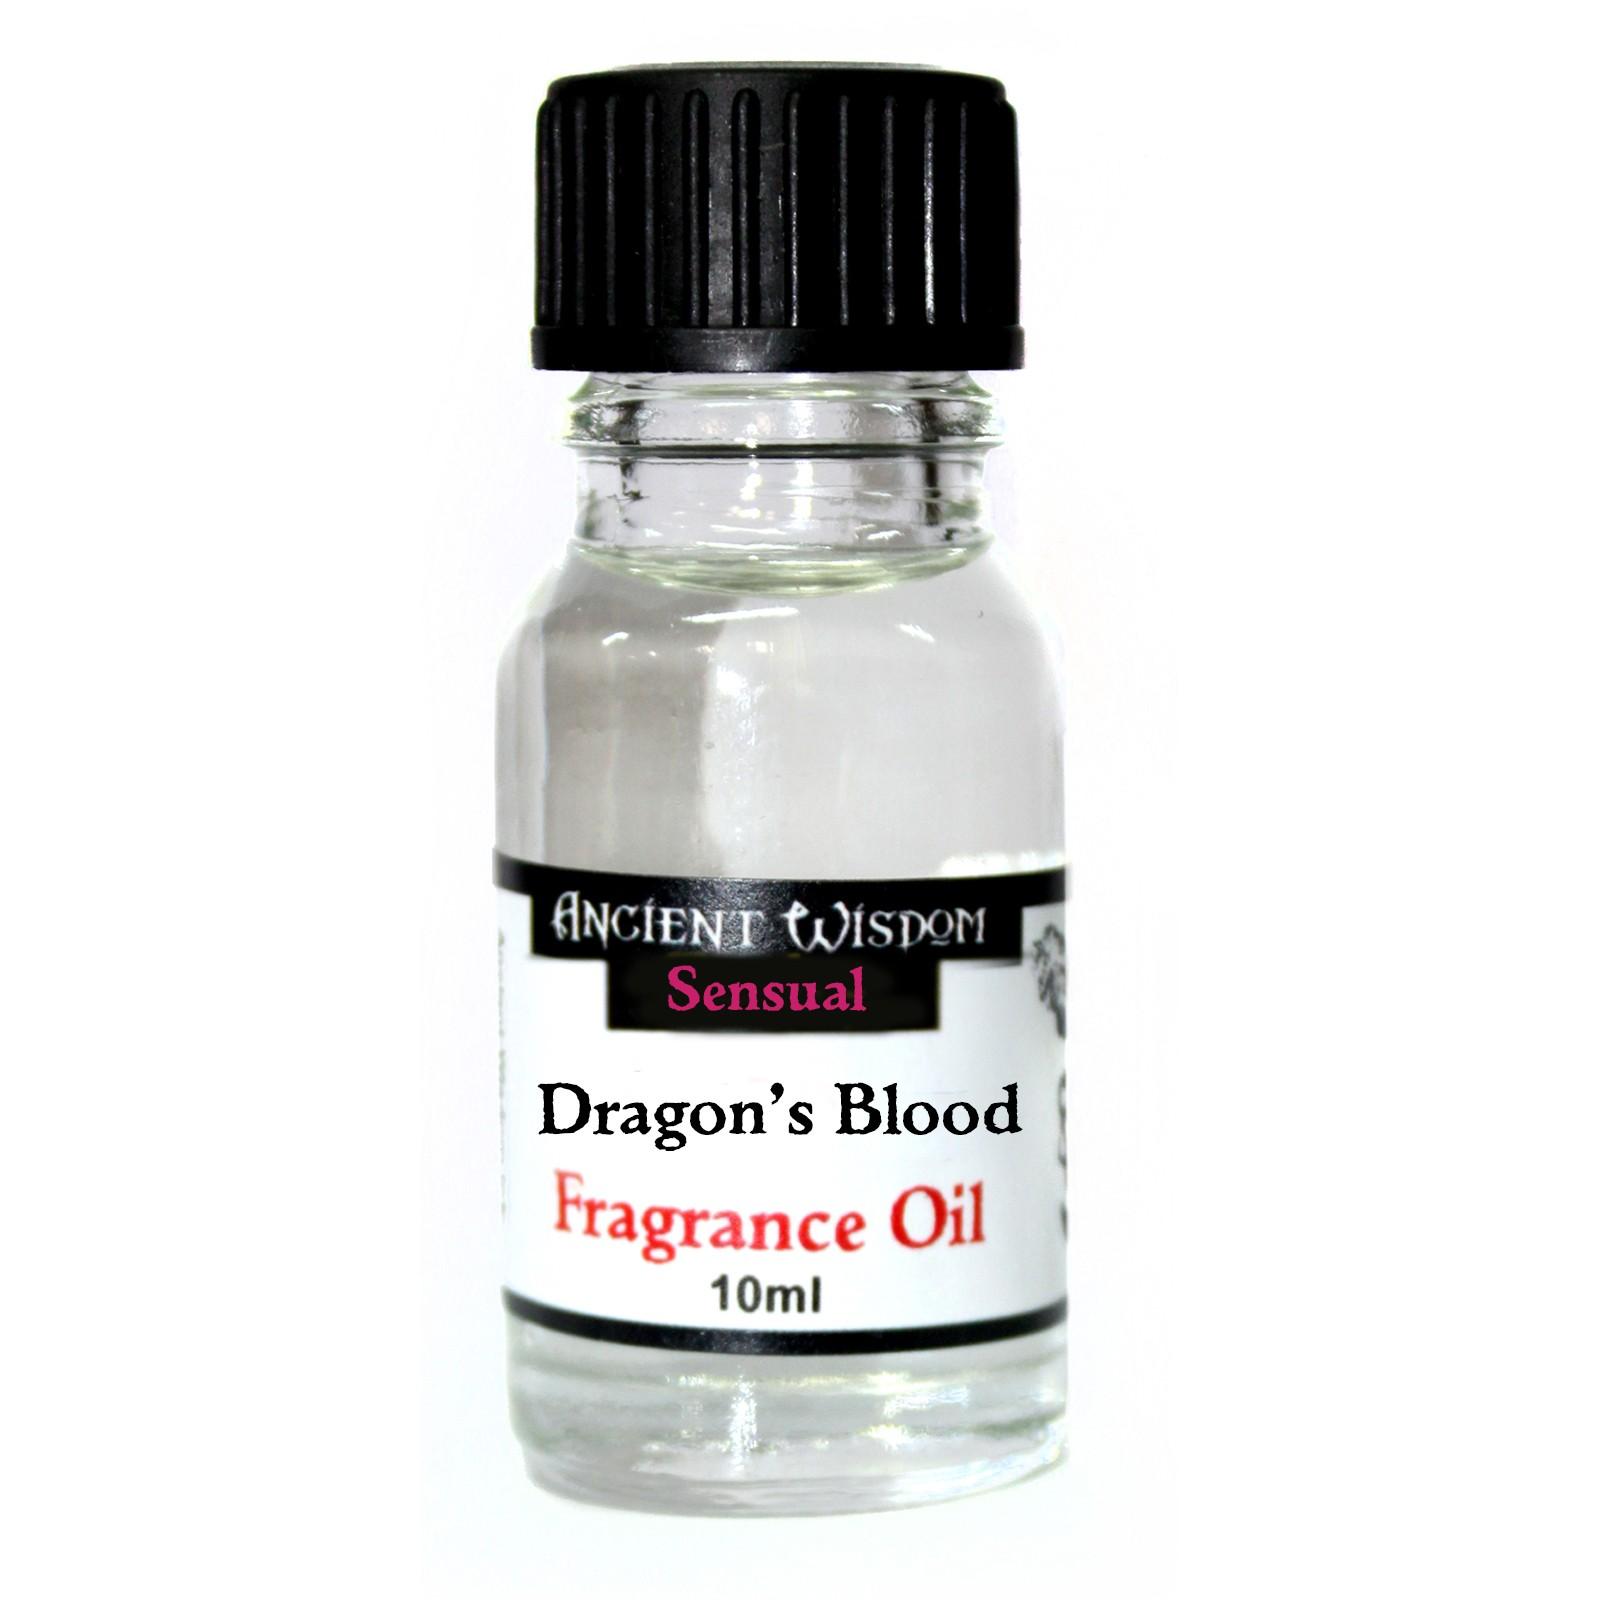 10ml Dragon's Blood Fragrance Oil